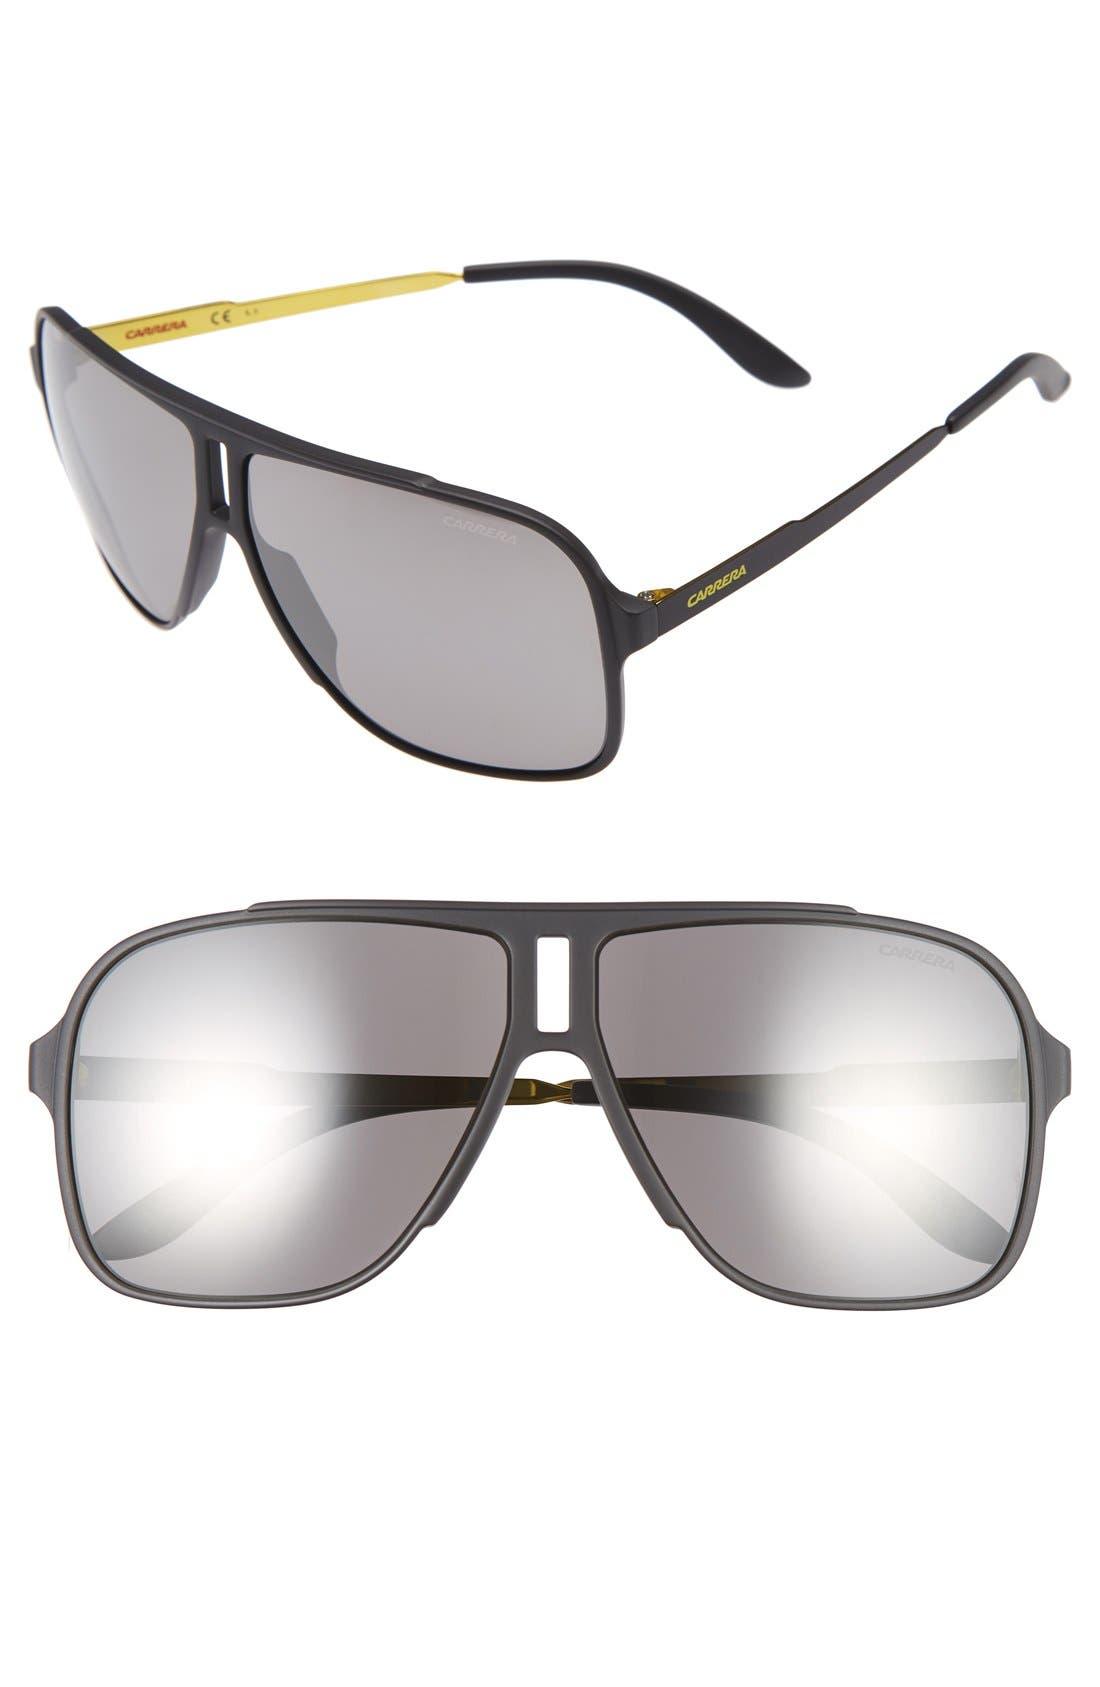 CARRERA EYEWEAR 61mm Sunglasses